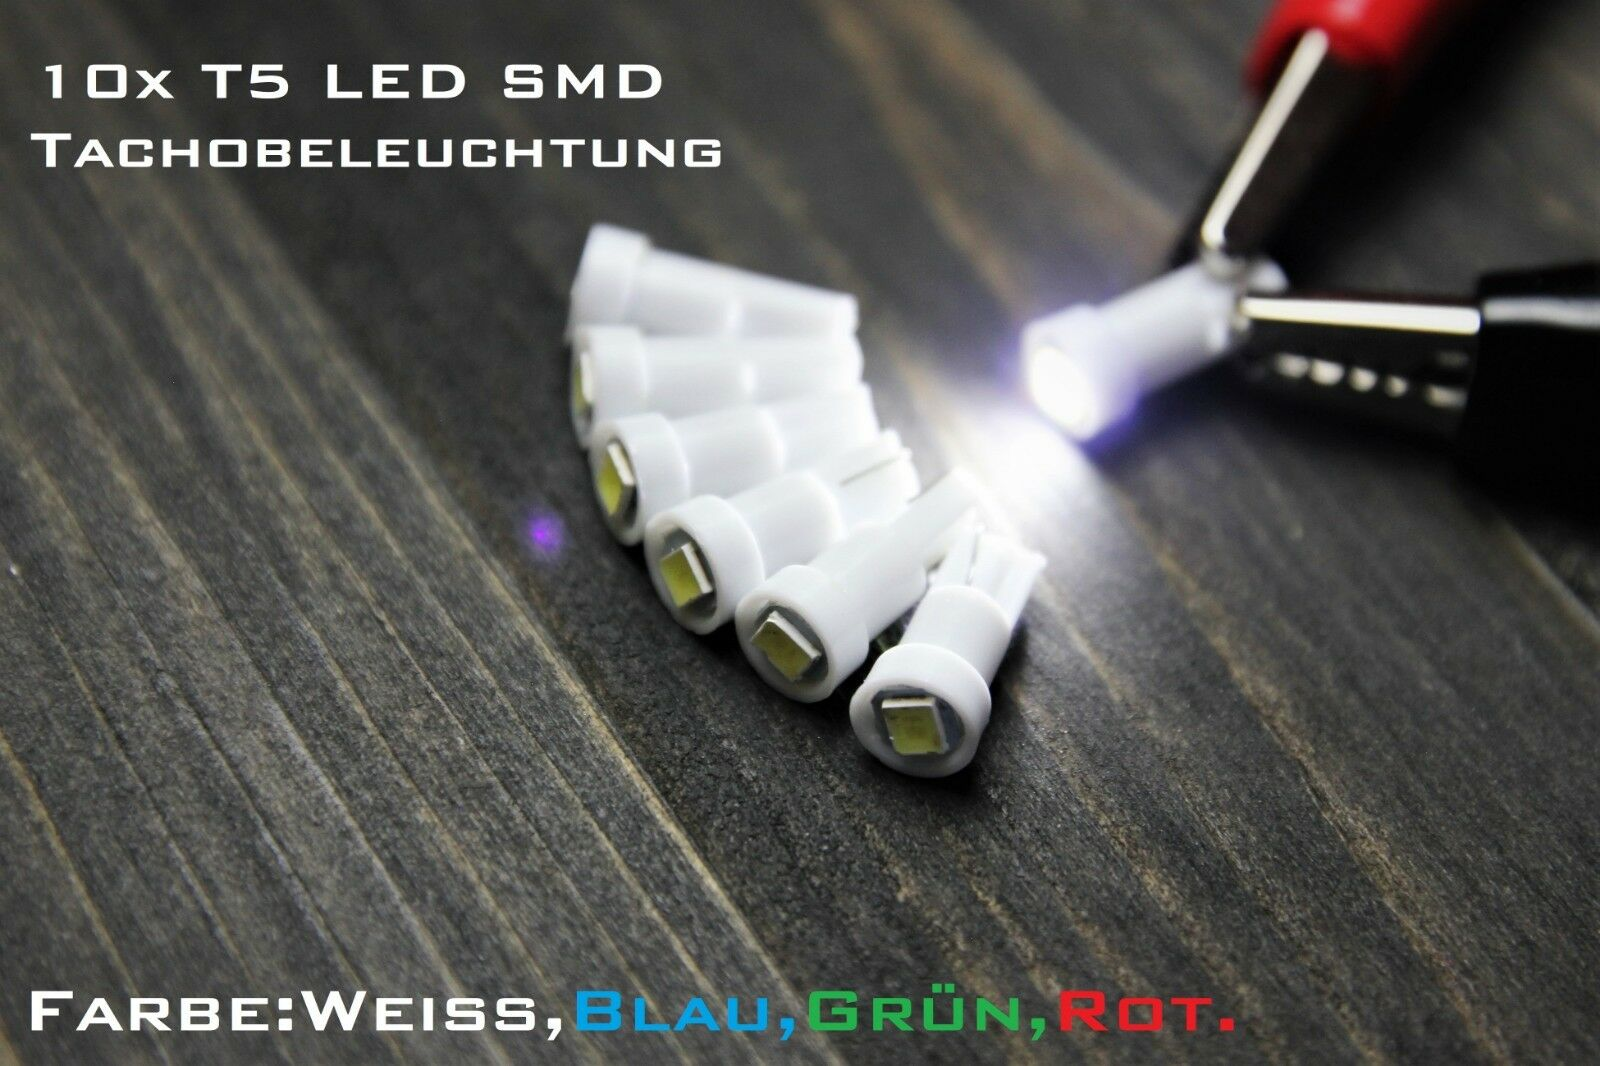 10x T5 LED SMD Tachobeleuchtung Innenraum W1,2W Rot Weiß Blau Grün